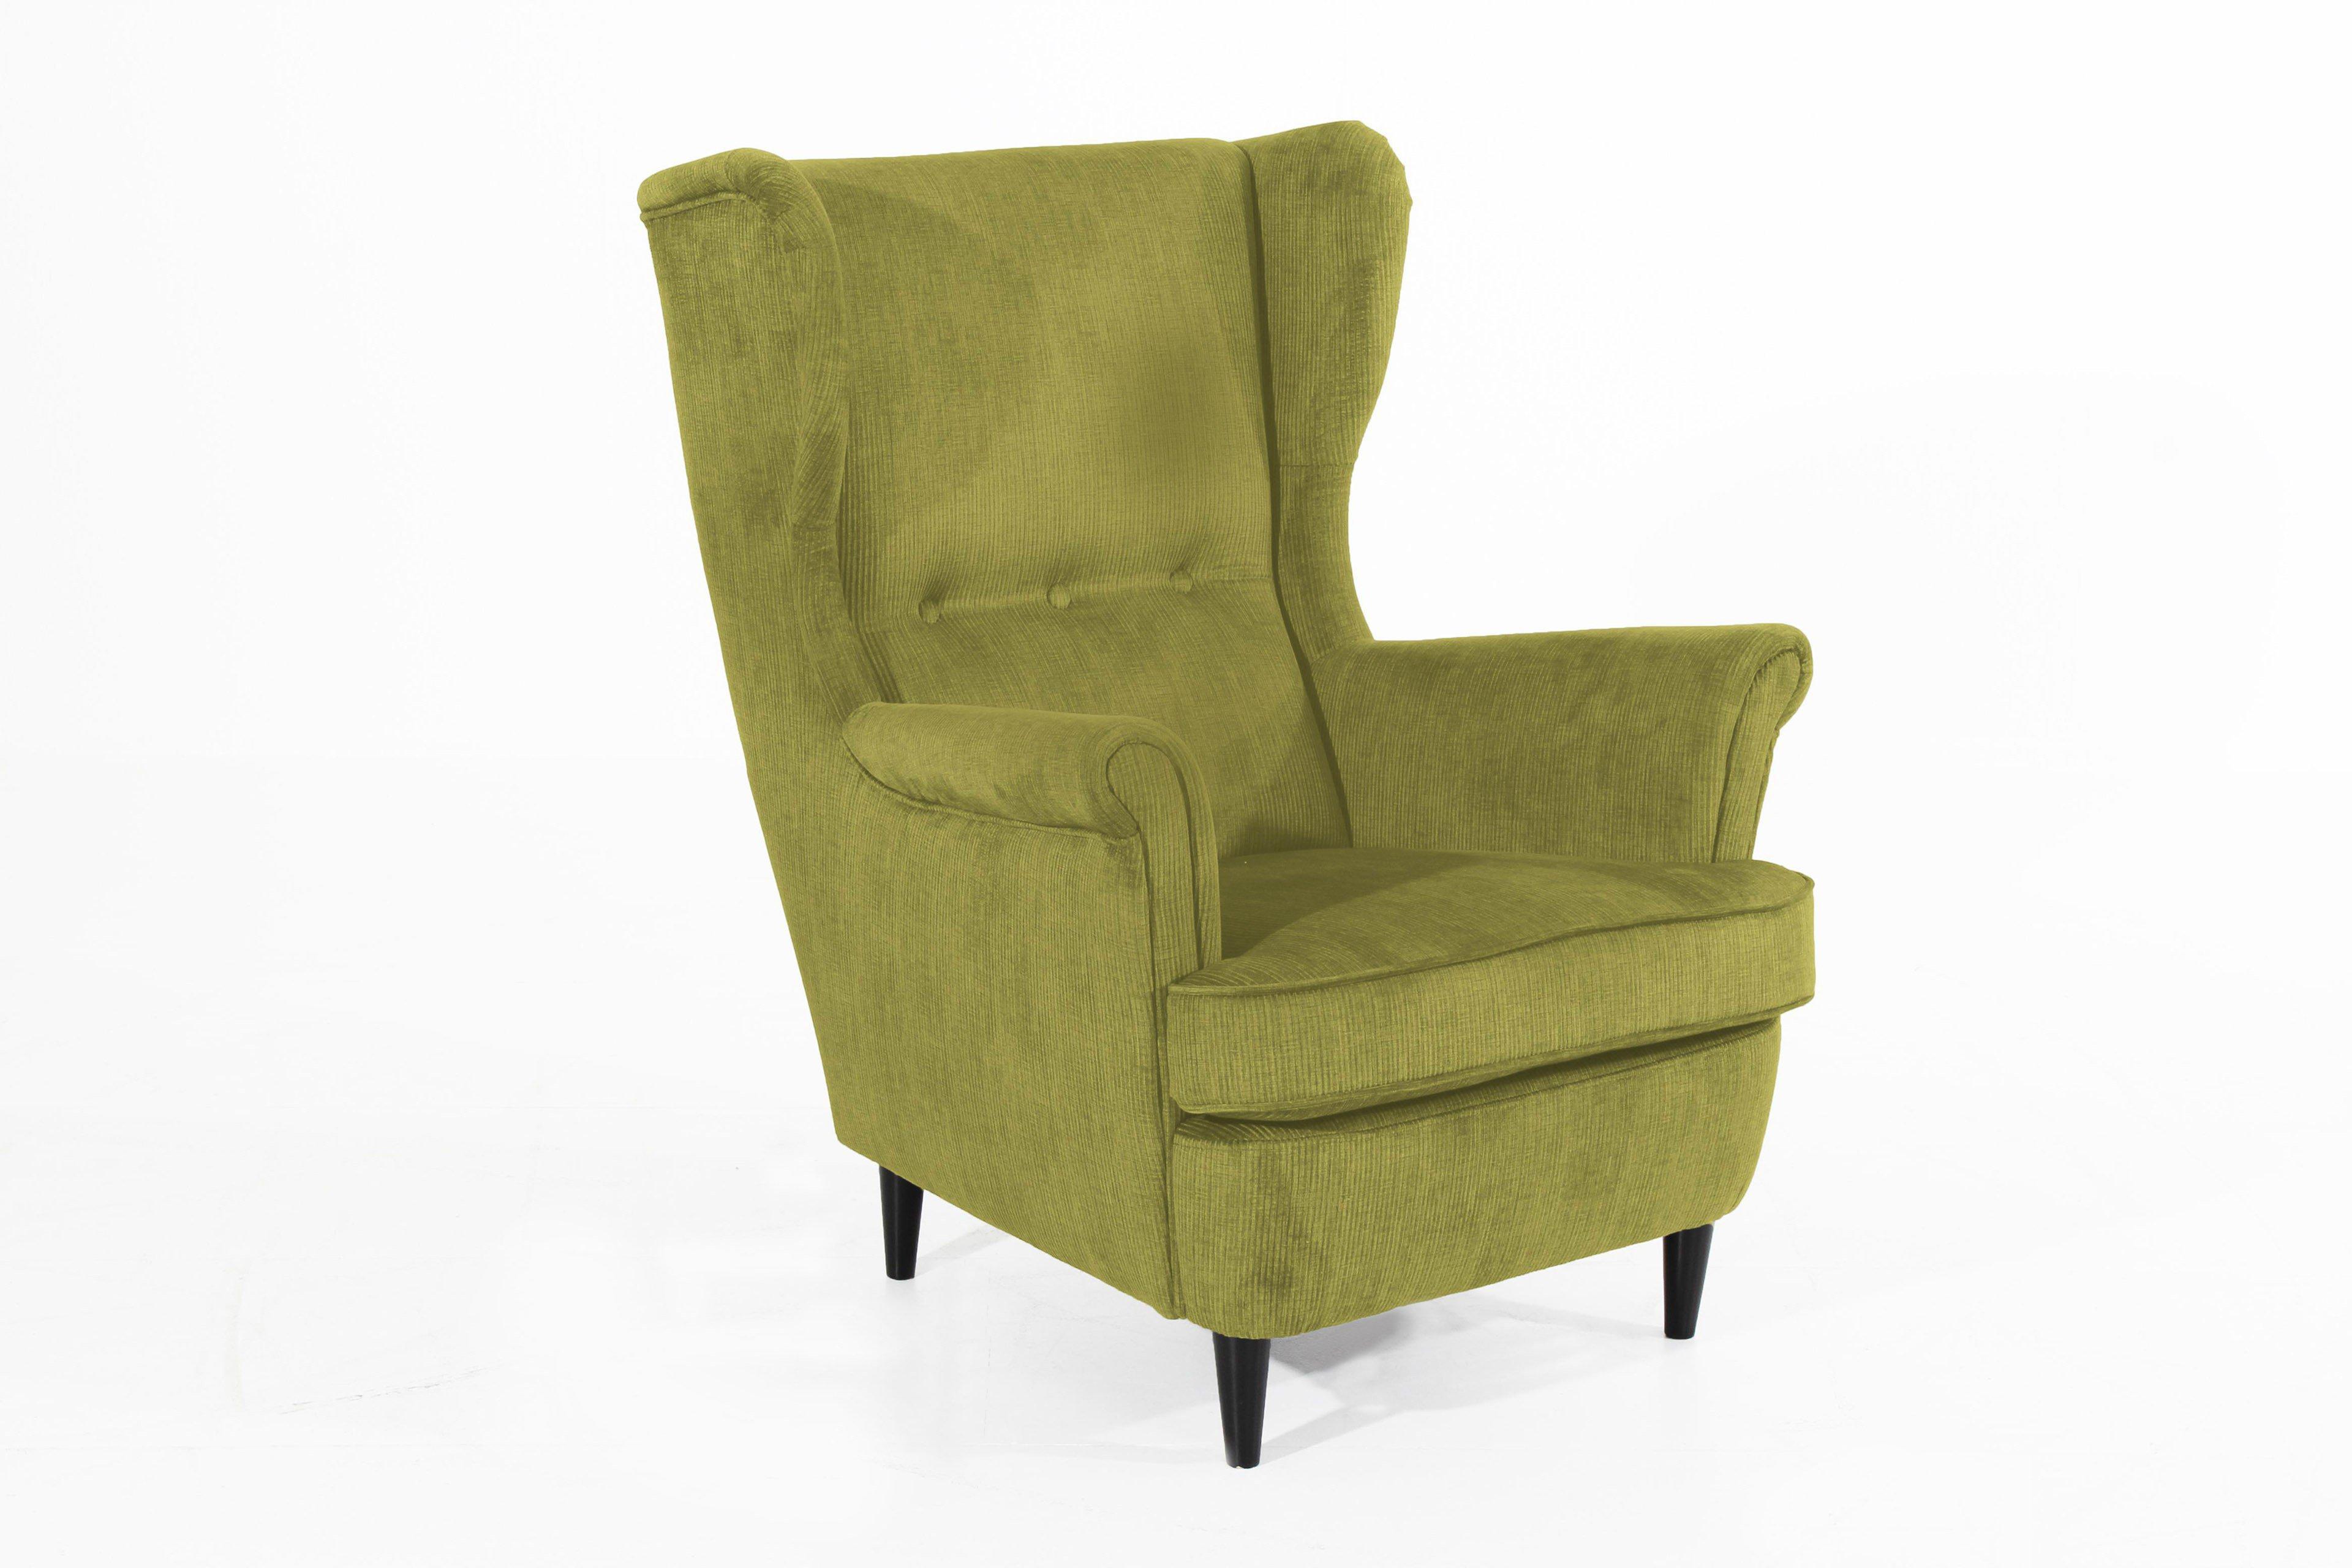 max winzer clint polstersessel in gr n m bel letz ihr online shop. Black Bedroom Furniture Sets. Home Design Ideas